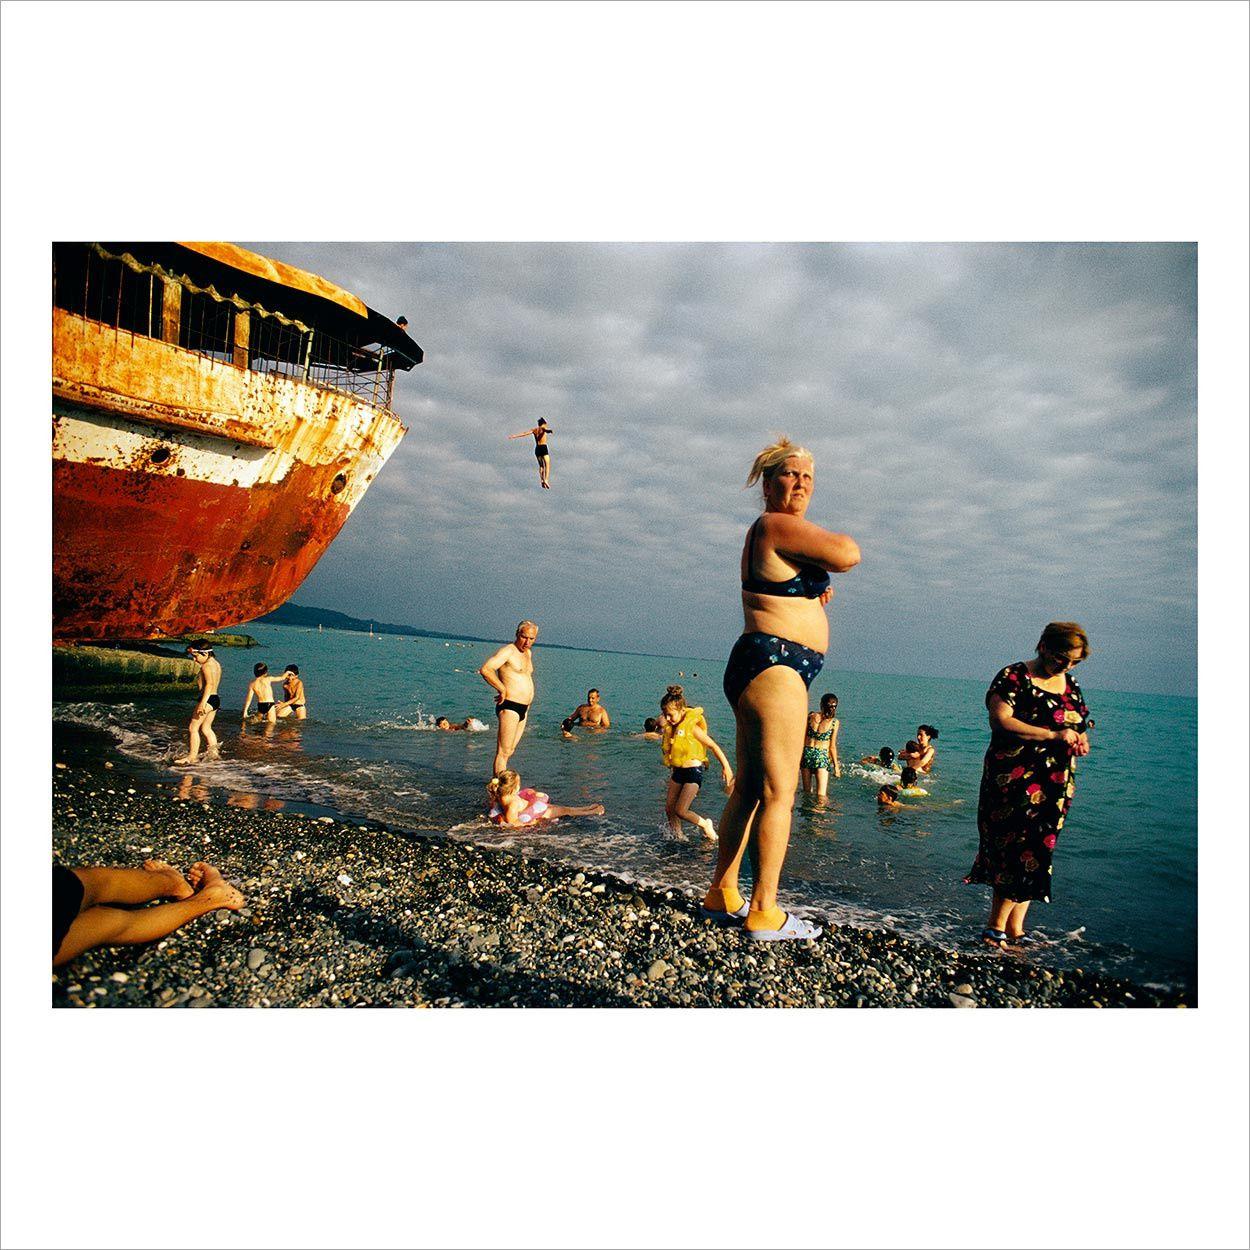 Sukhumi Beach, Abkhazia, 2005. © Jonas Bendiksen/Magnum Photos